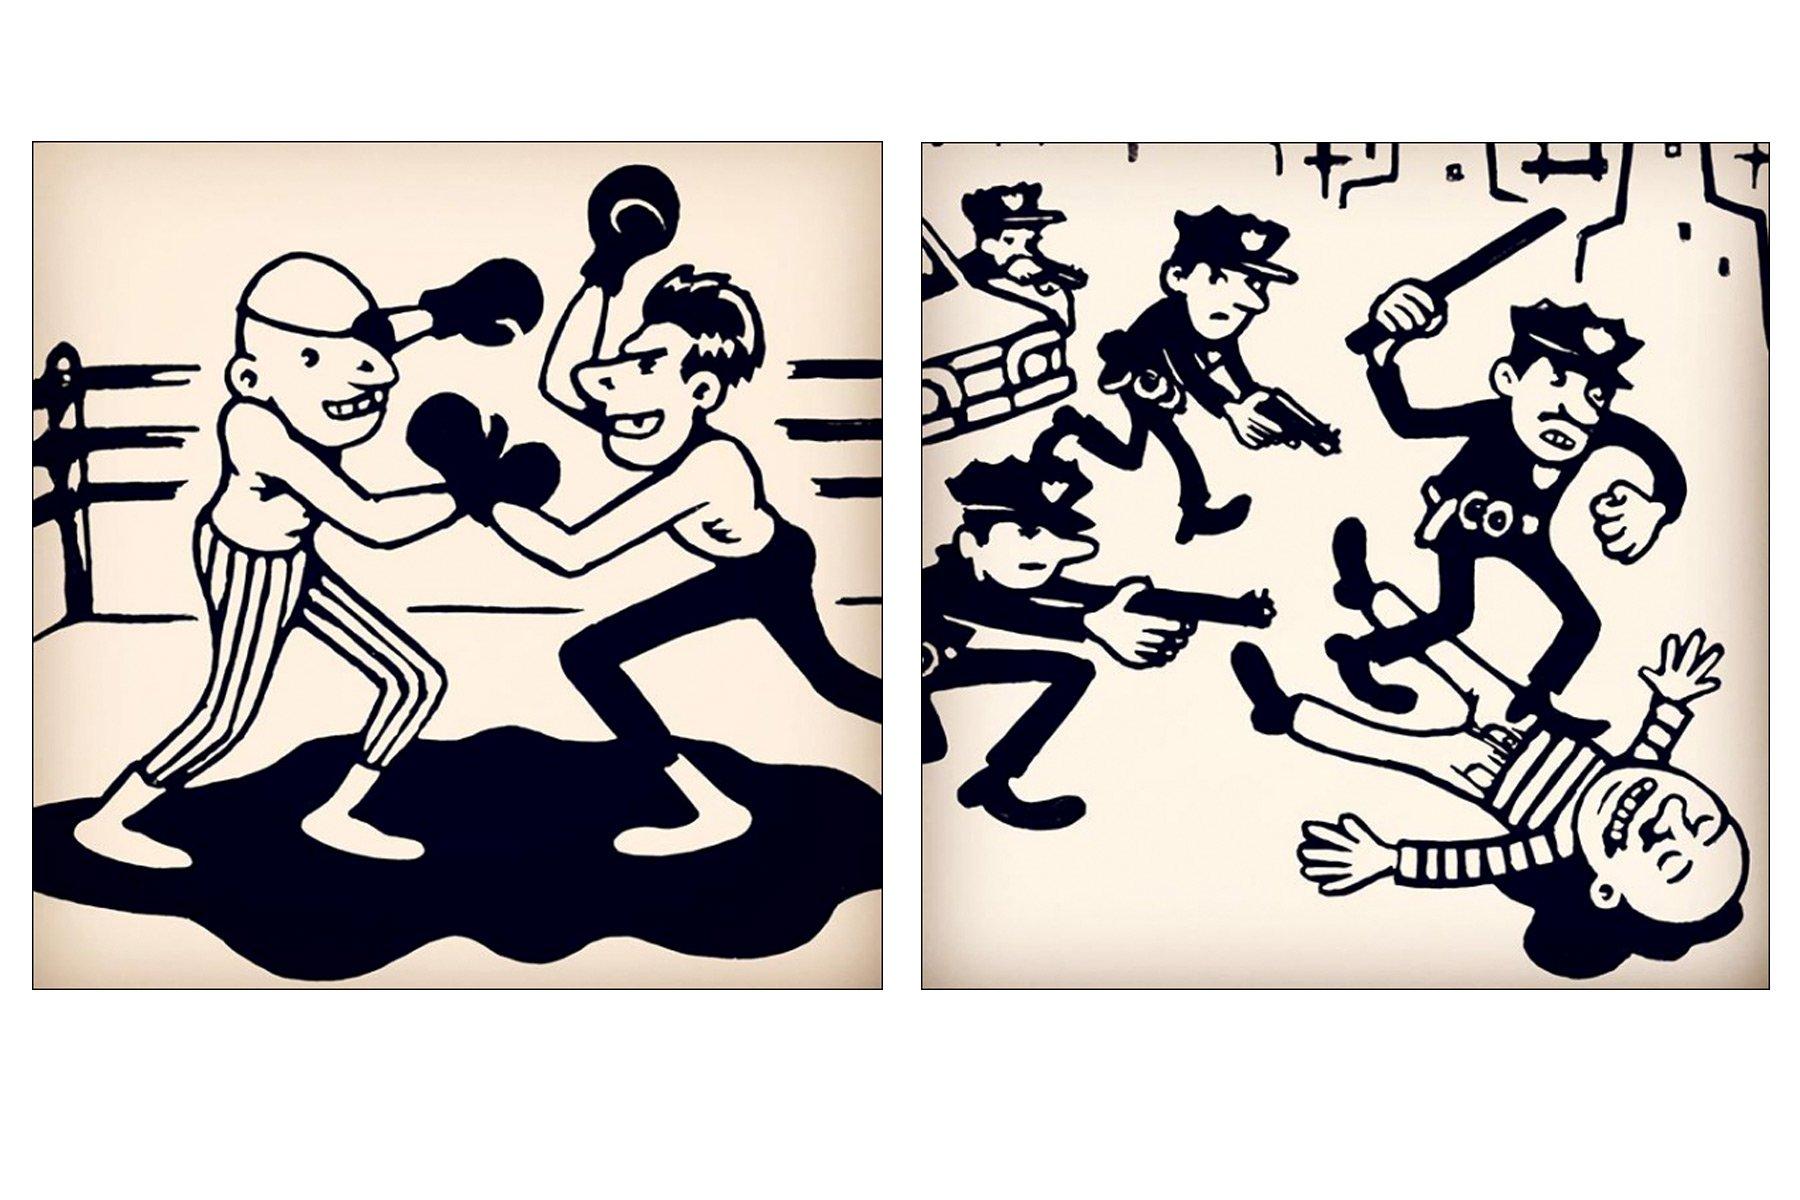 Drawings by NYC artist Avi Spivak. Ponyboy magazine.